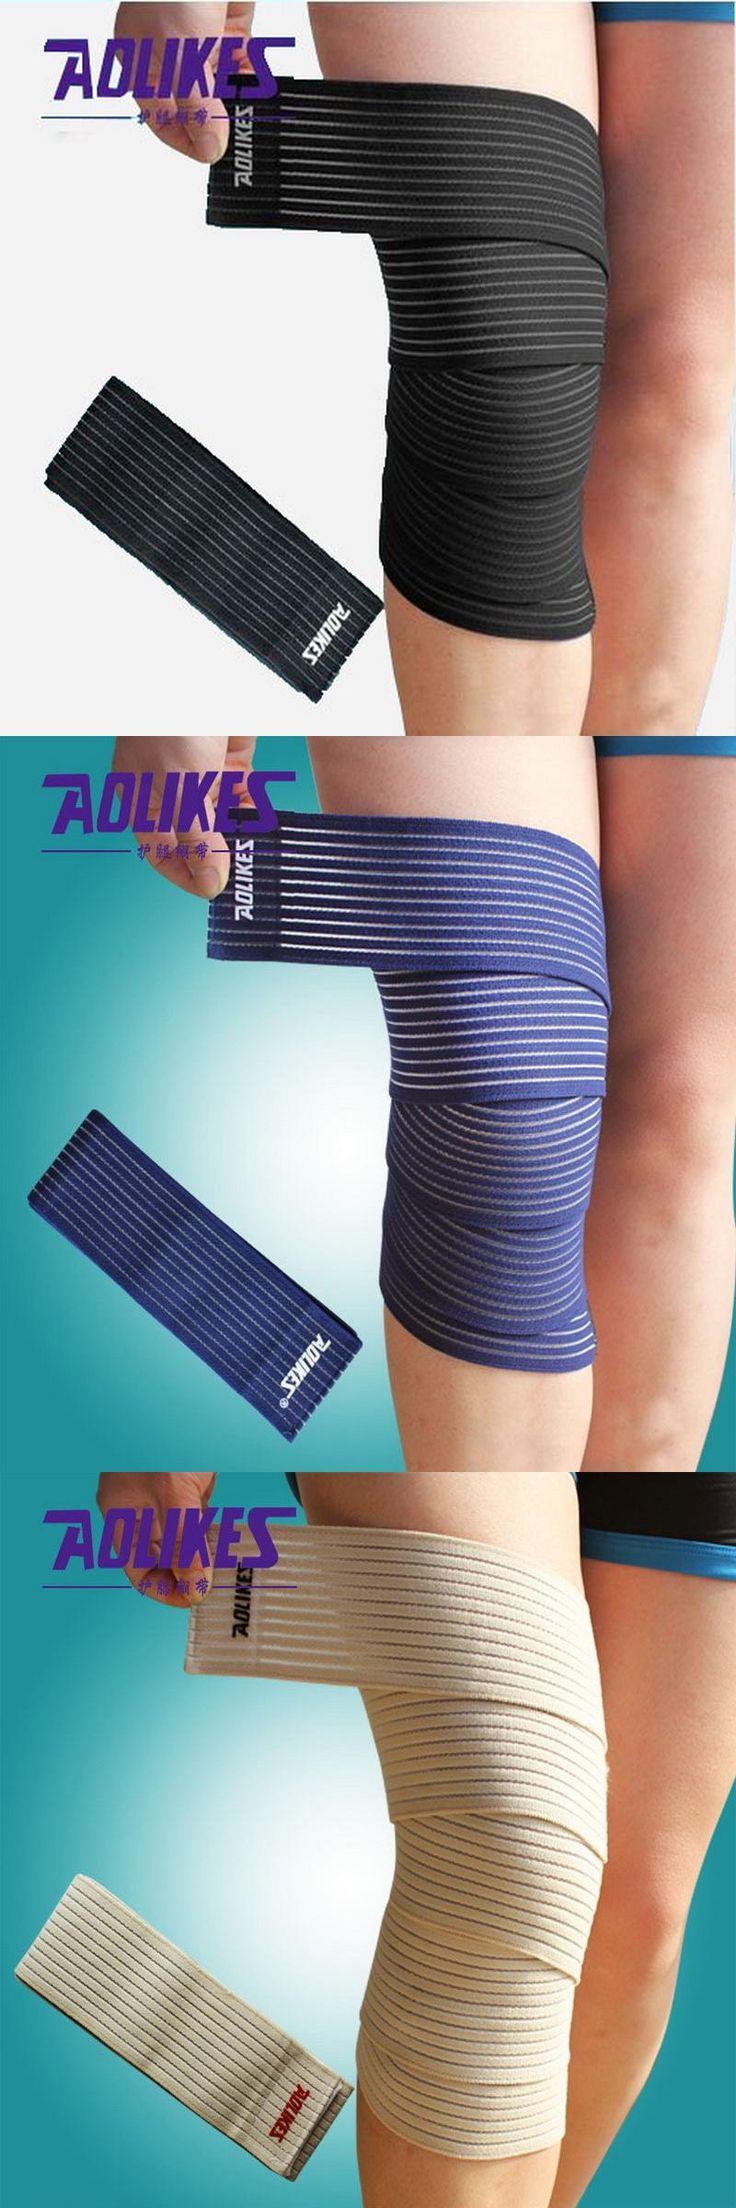 [Visit to Buy] AOLIKES 1 Pair 180*7.5 cm High Elastic Bandage For Knee Elbow Leg Compression Bandagem Elastica Sport Tape vendas para deporte #Advertisement